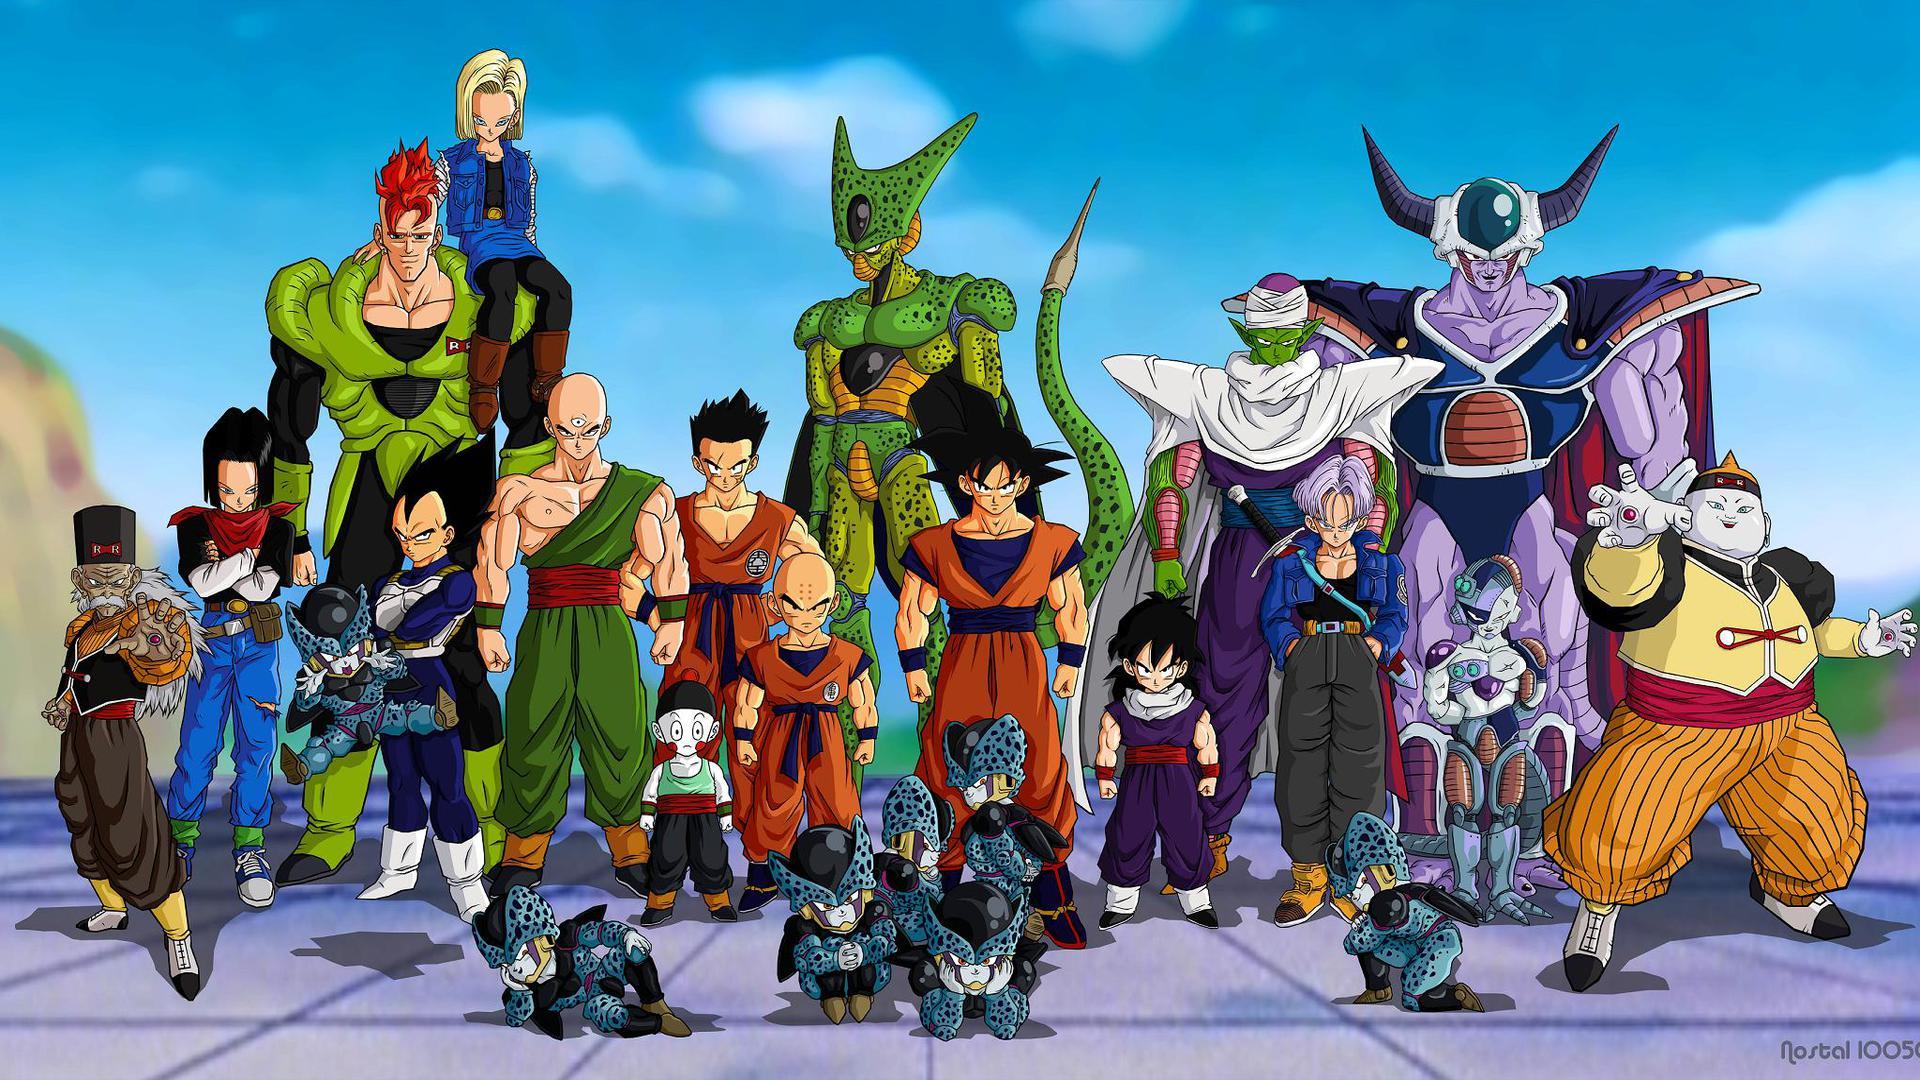 Dragon Ball Z Images HD Wallpaper of Anime   hdwallpaper2013com 1920x1080